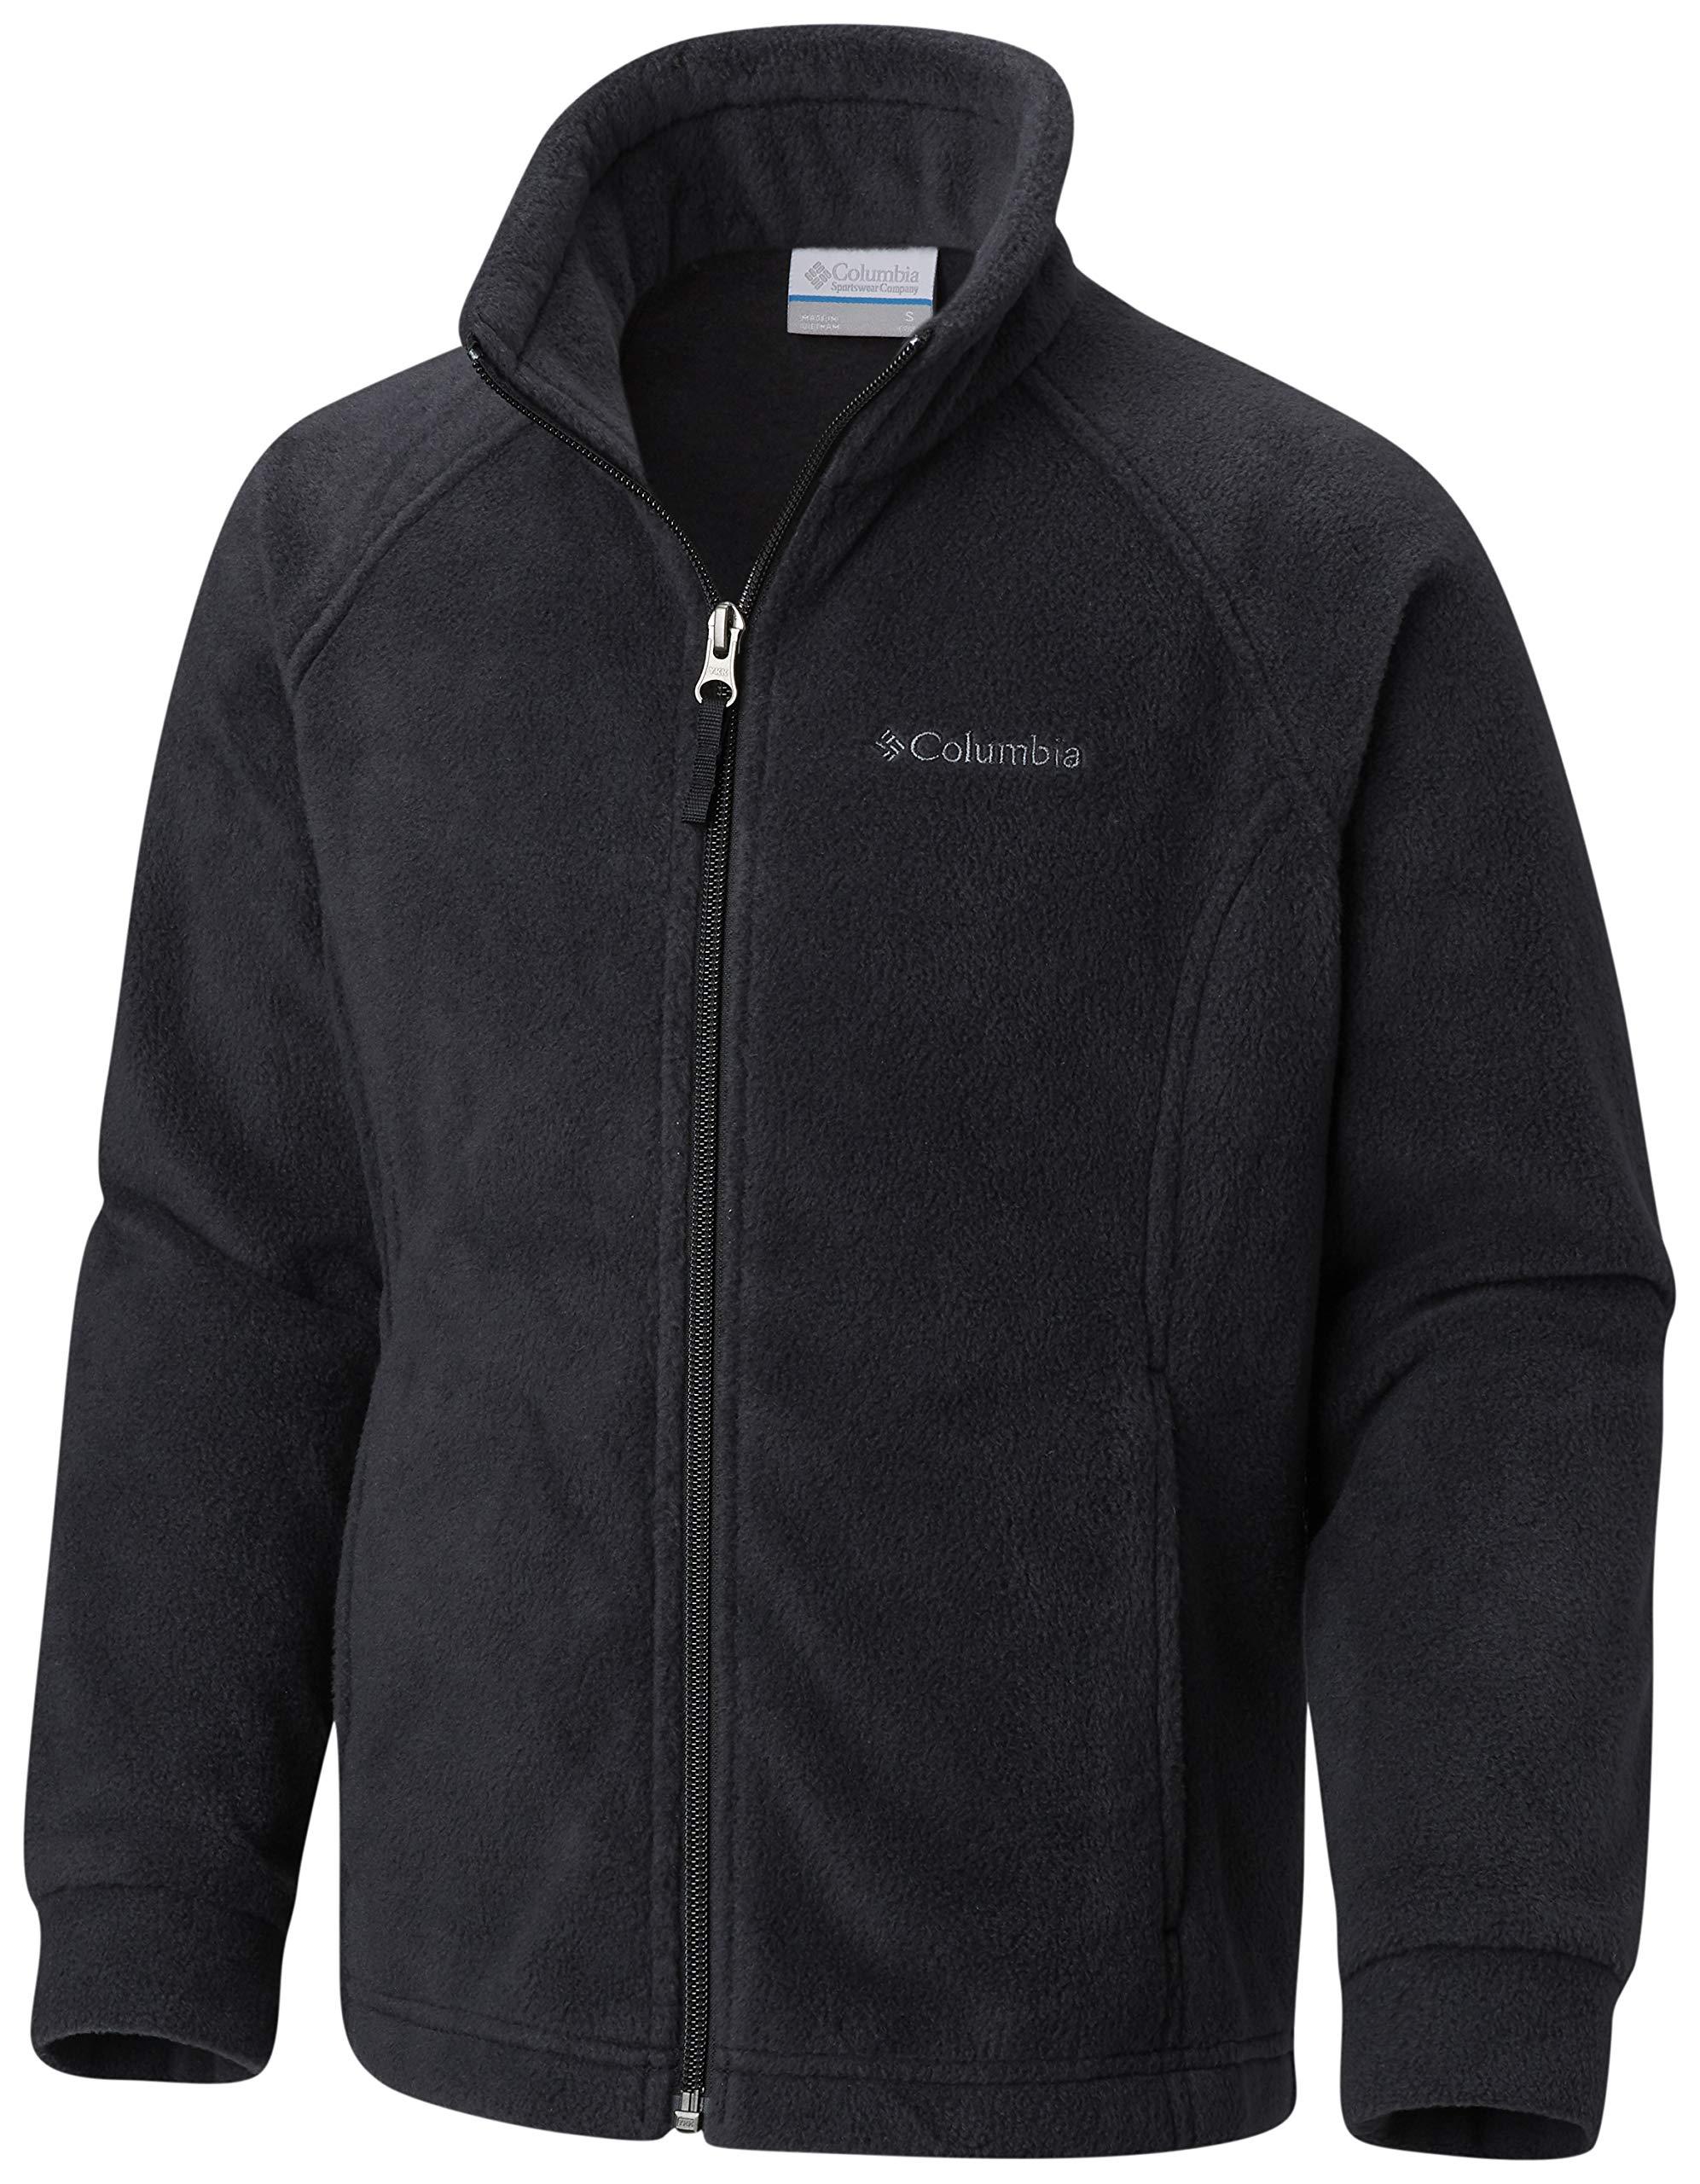 Columbia Little Girls' Benton Springs Fleece Jacket, Black, XX-Small